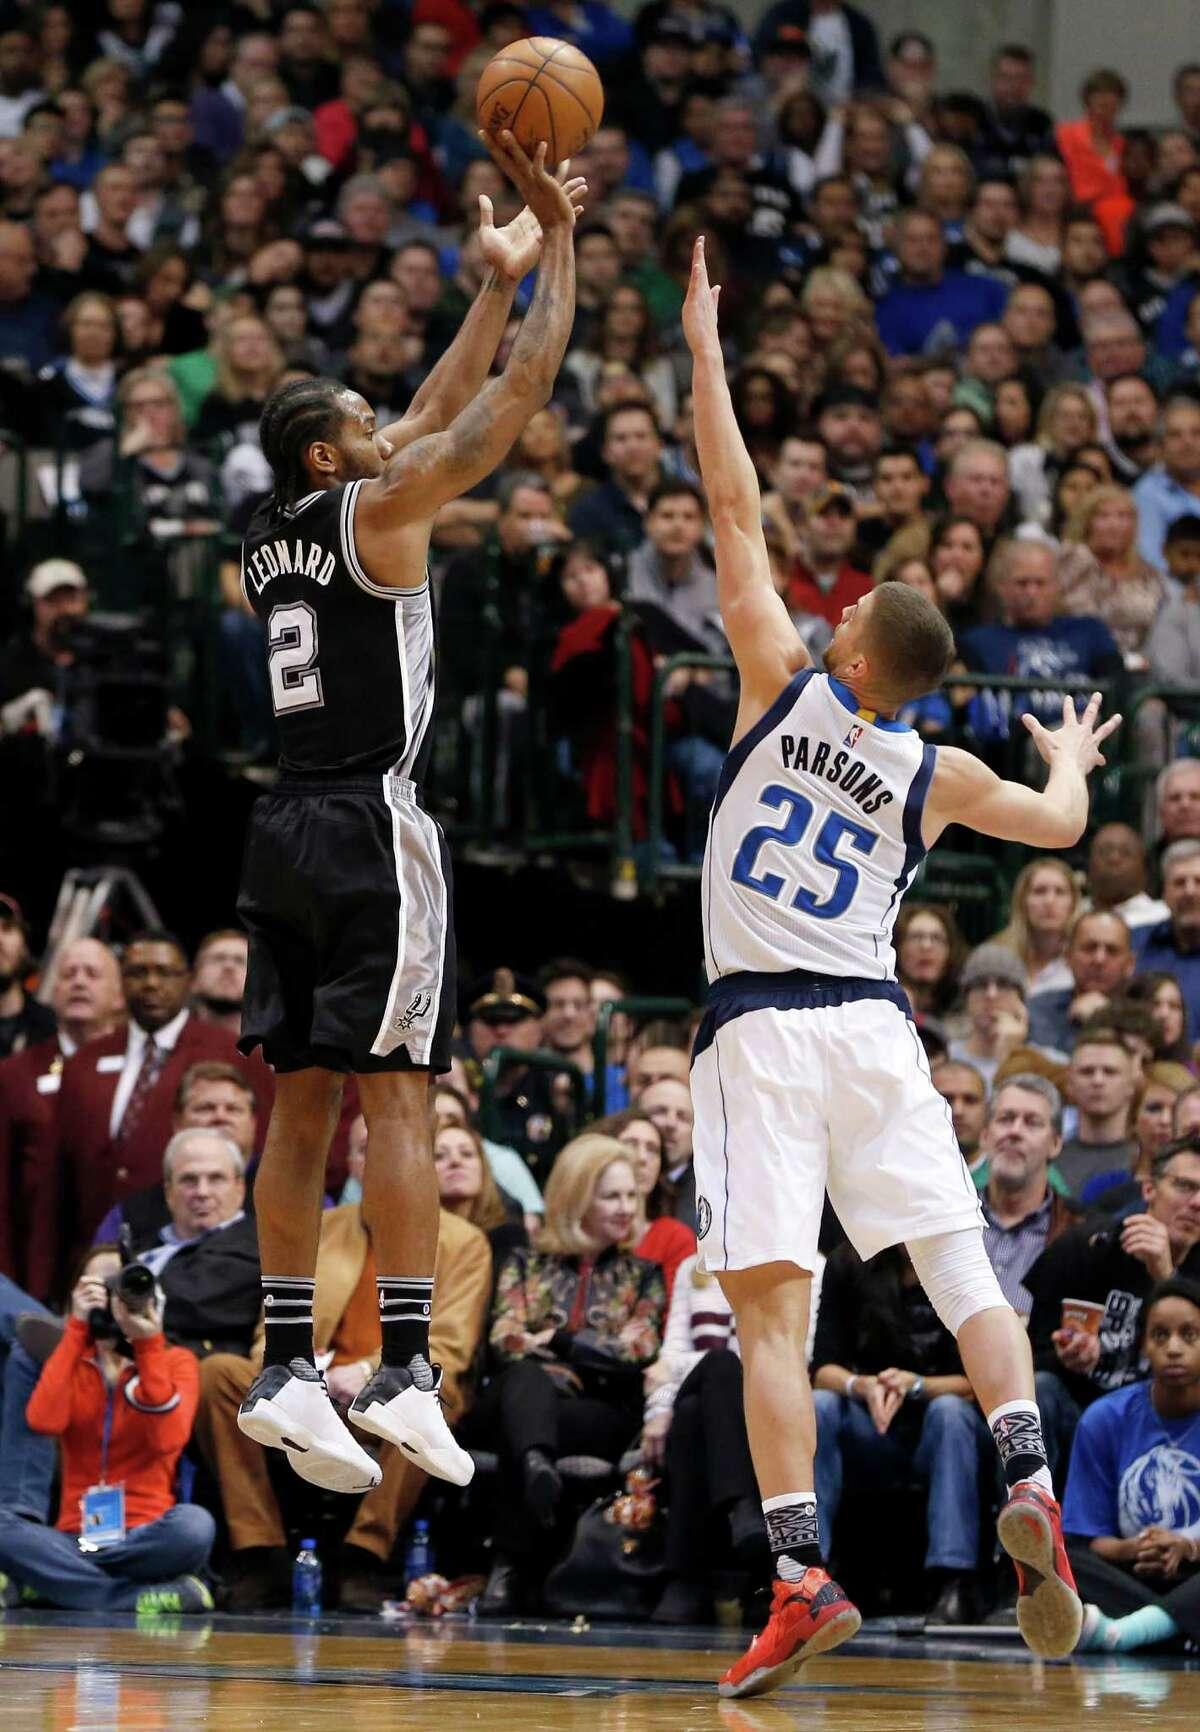 San Antonio Spurs forward Kawhi Leonard (2) shoots over Dallas Mavericks' Chandler Parsons (25) during the first half of an NBA basketball game Friday, Feb. 5, 2016, in Dallas. (AP Photo/Jim Cowsert)